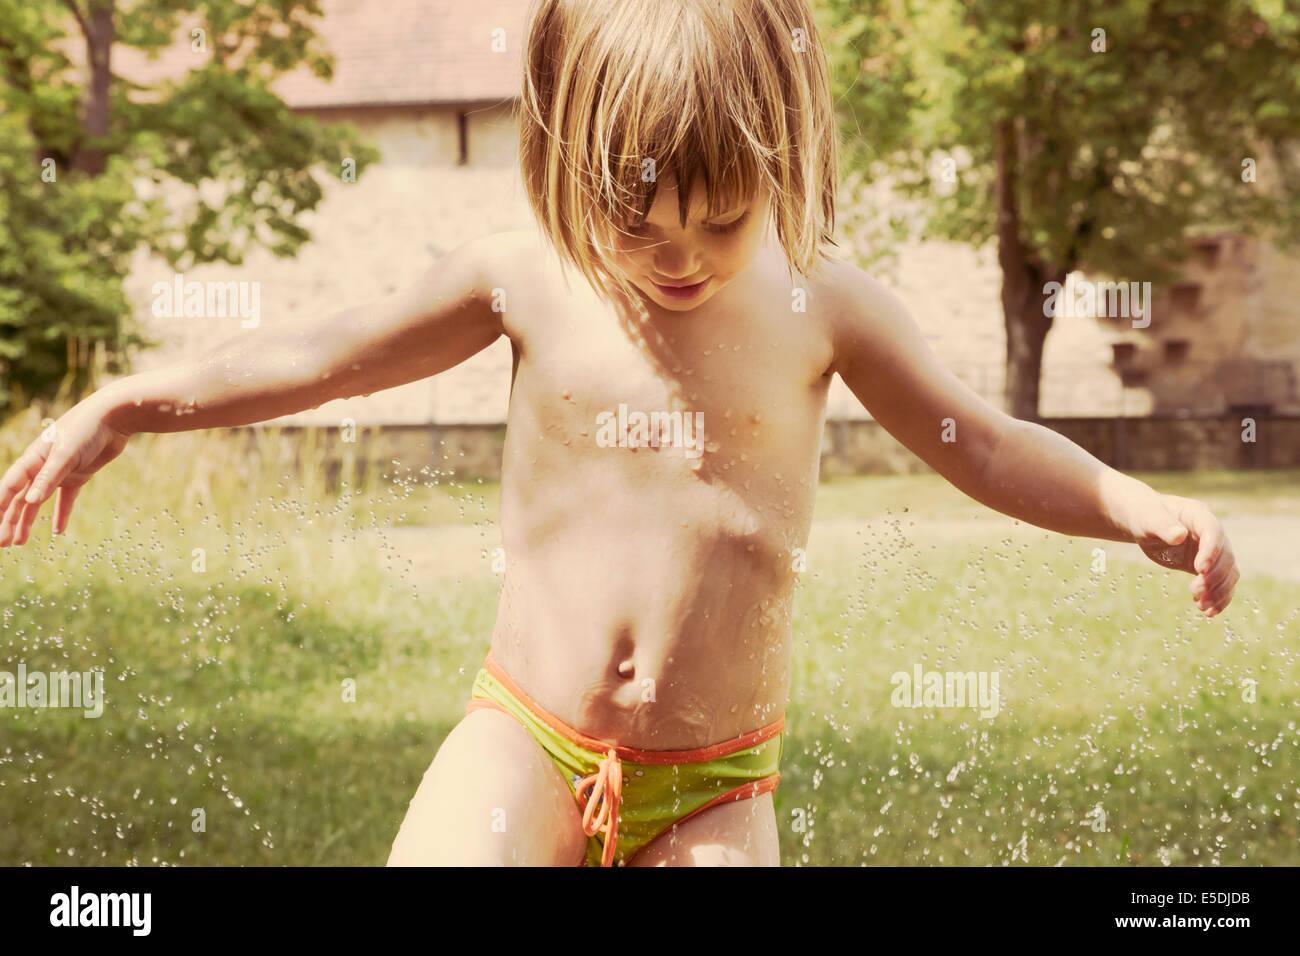 Portrait of little girl having fun with lawn sprinkler in the garten - Stock Image